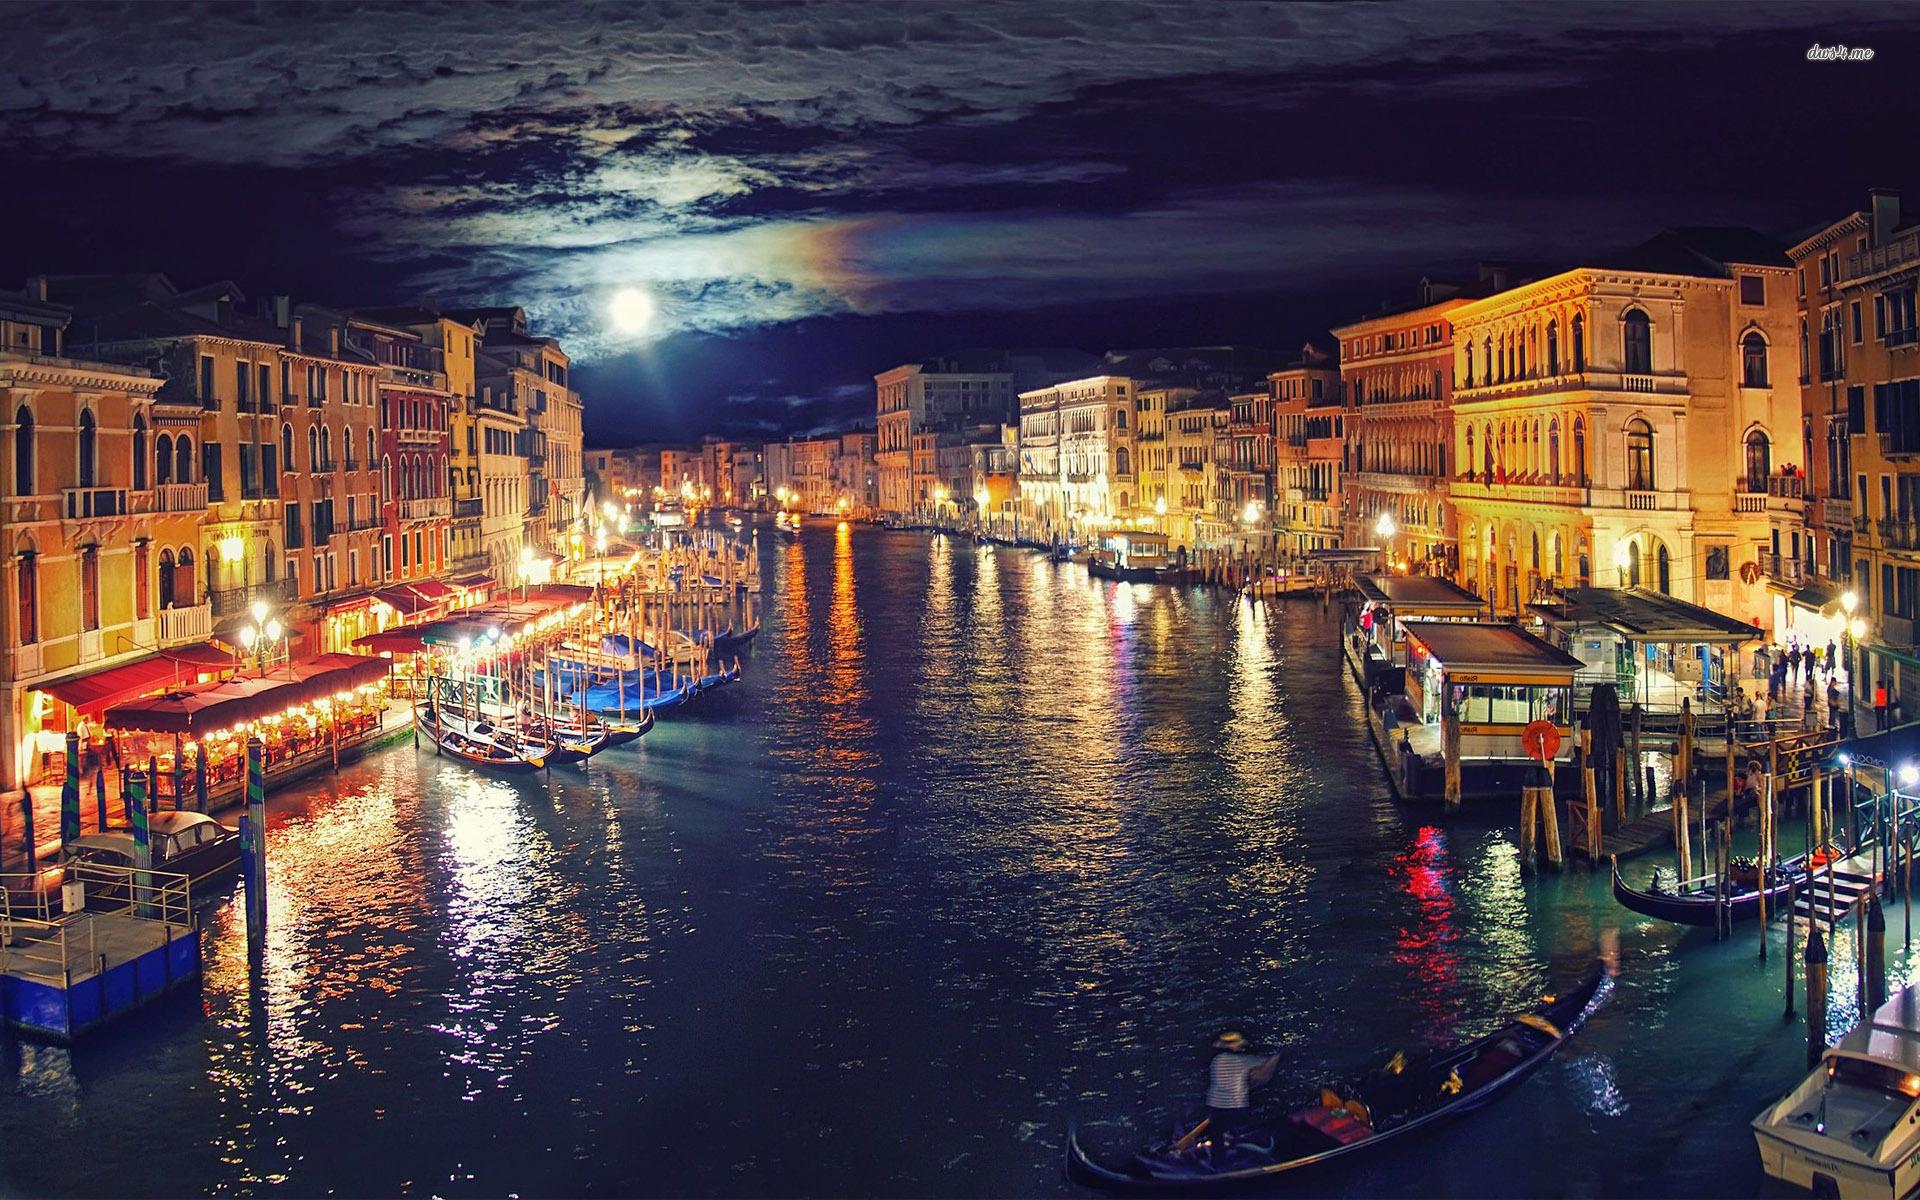 Venice at night wallpaper Gallery 1920x1200